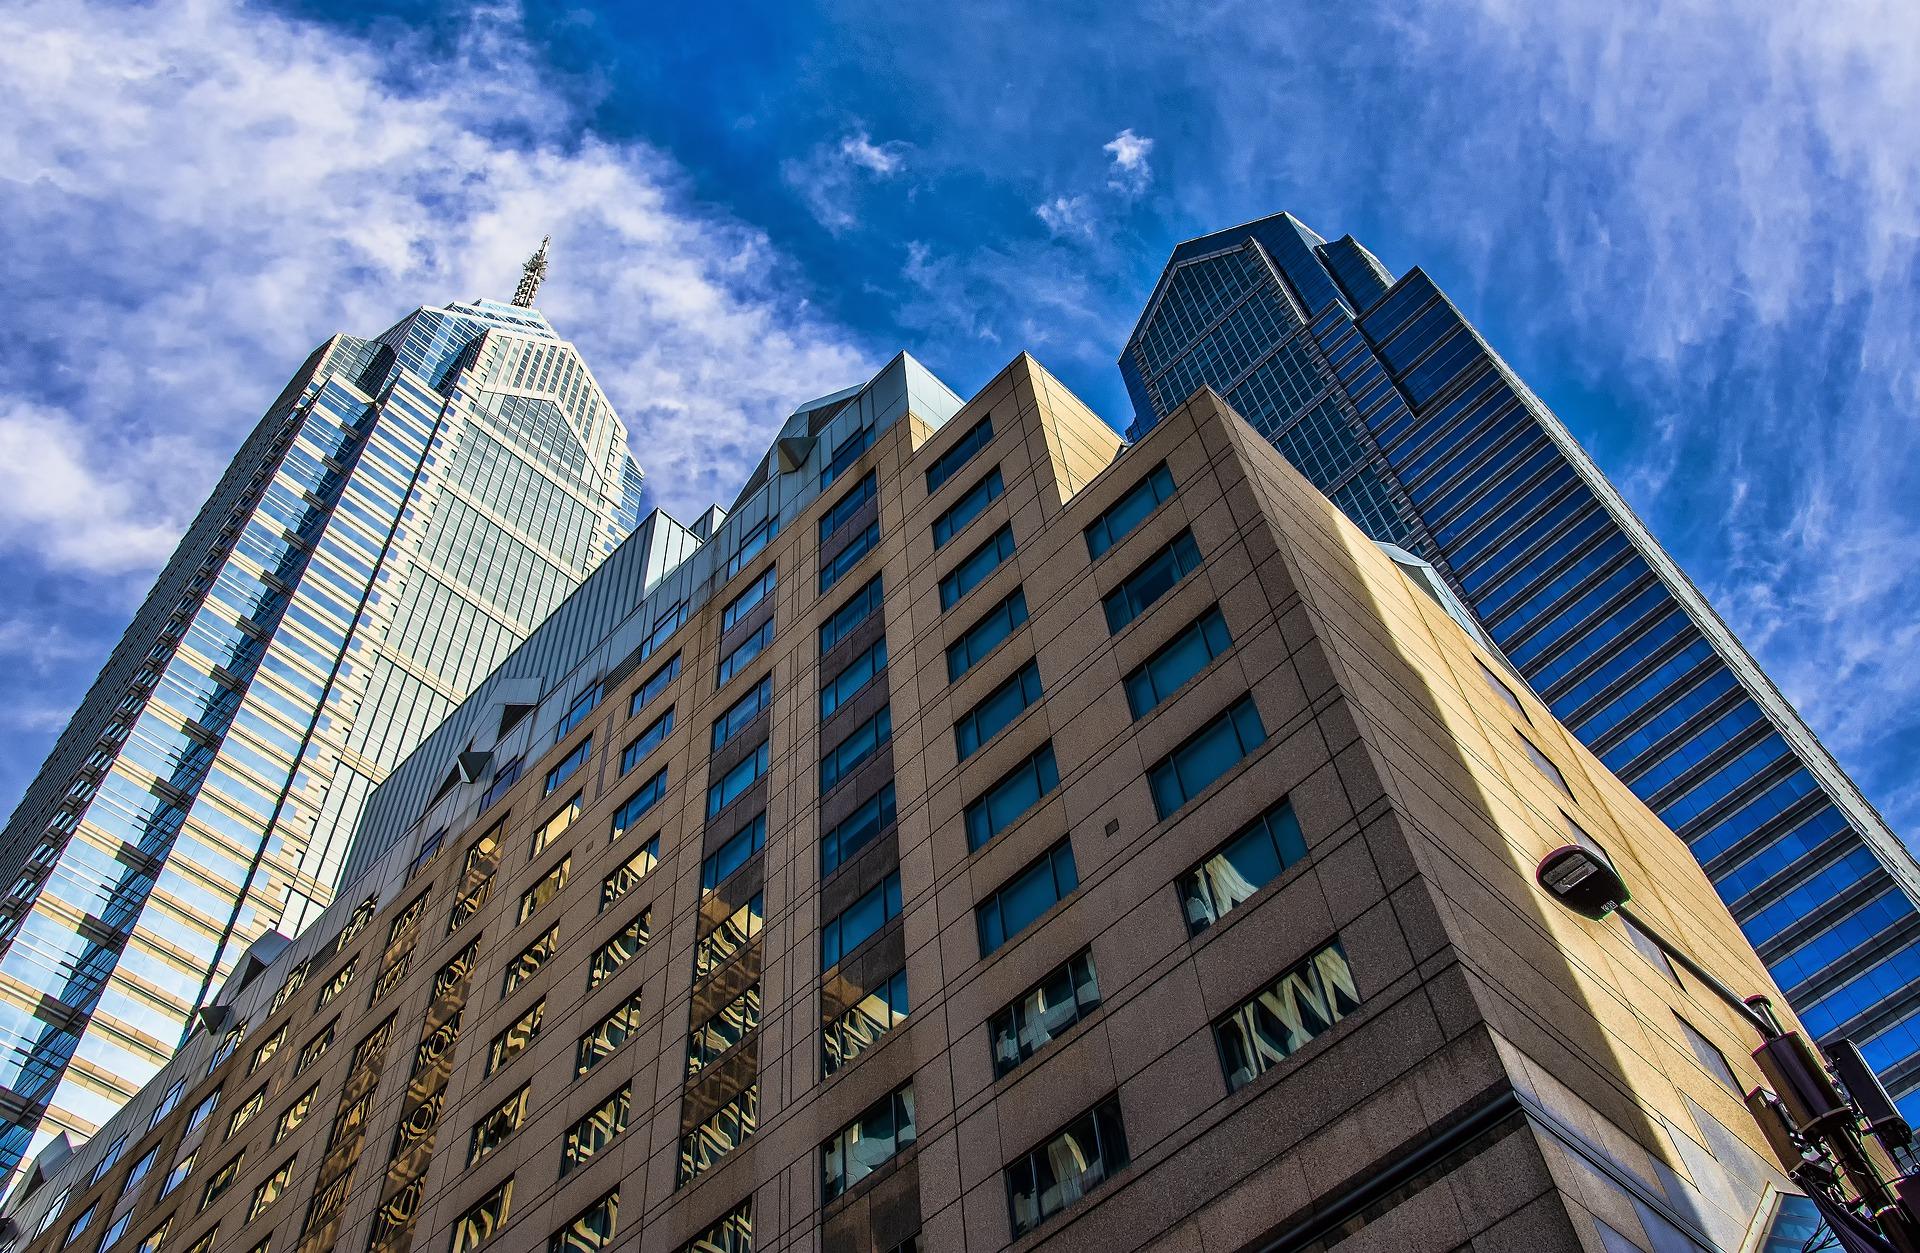 Philadelphia skyline | Image by Bruce Emmerling from Pixabay